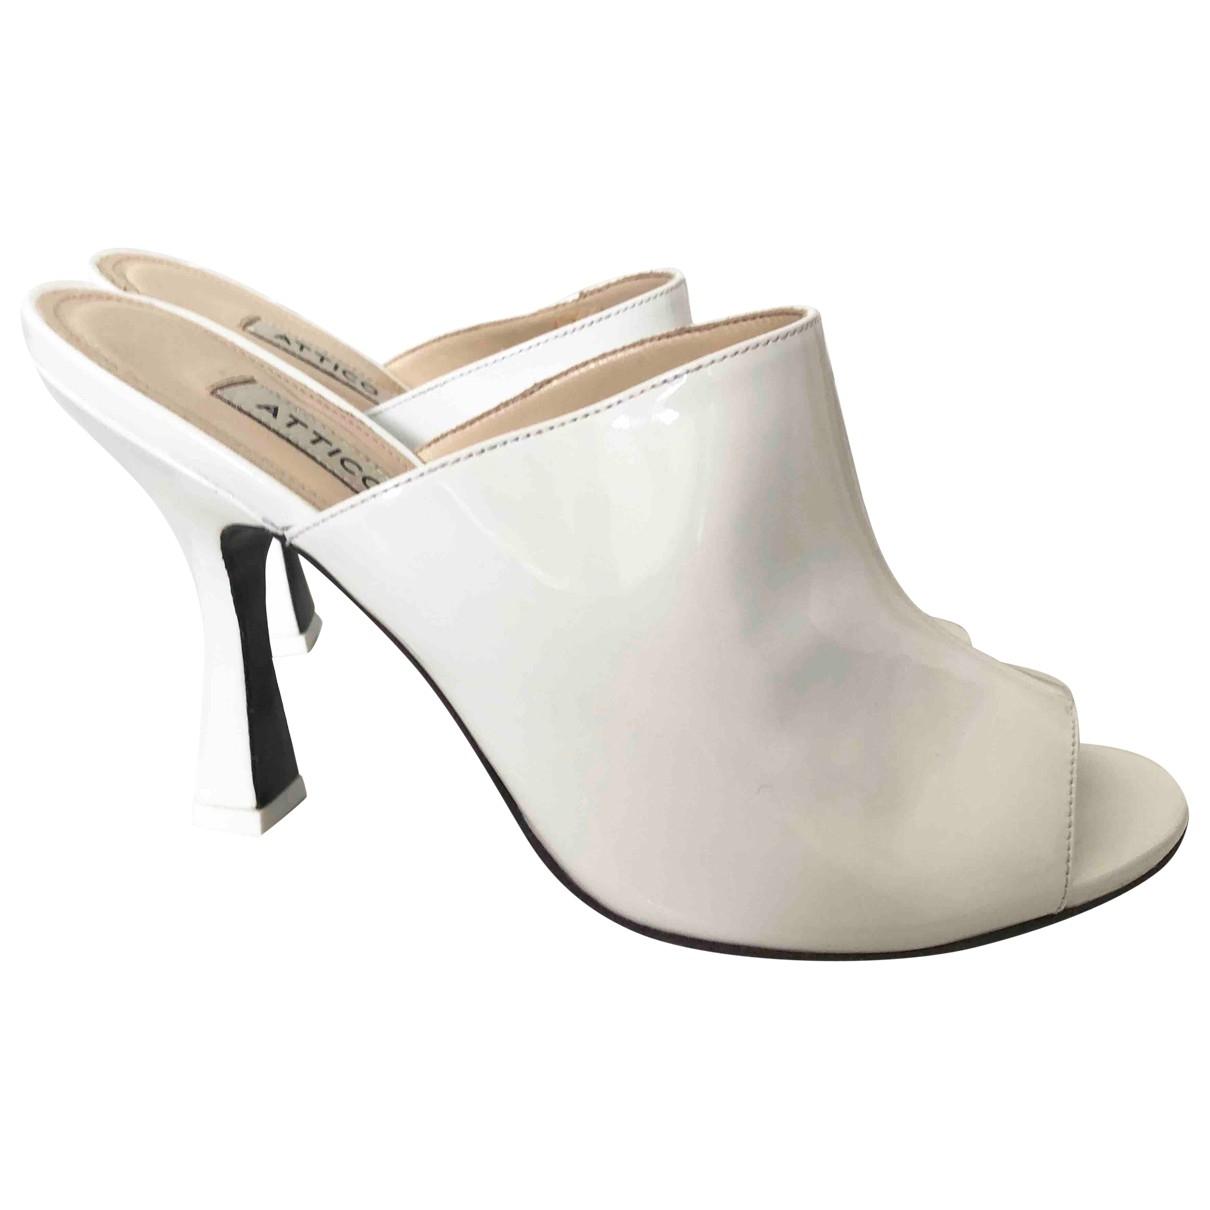 Attico \N White Patent leather Mules & Clogs for Women 40 EU